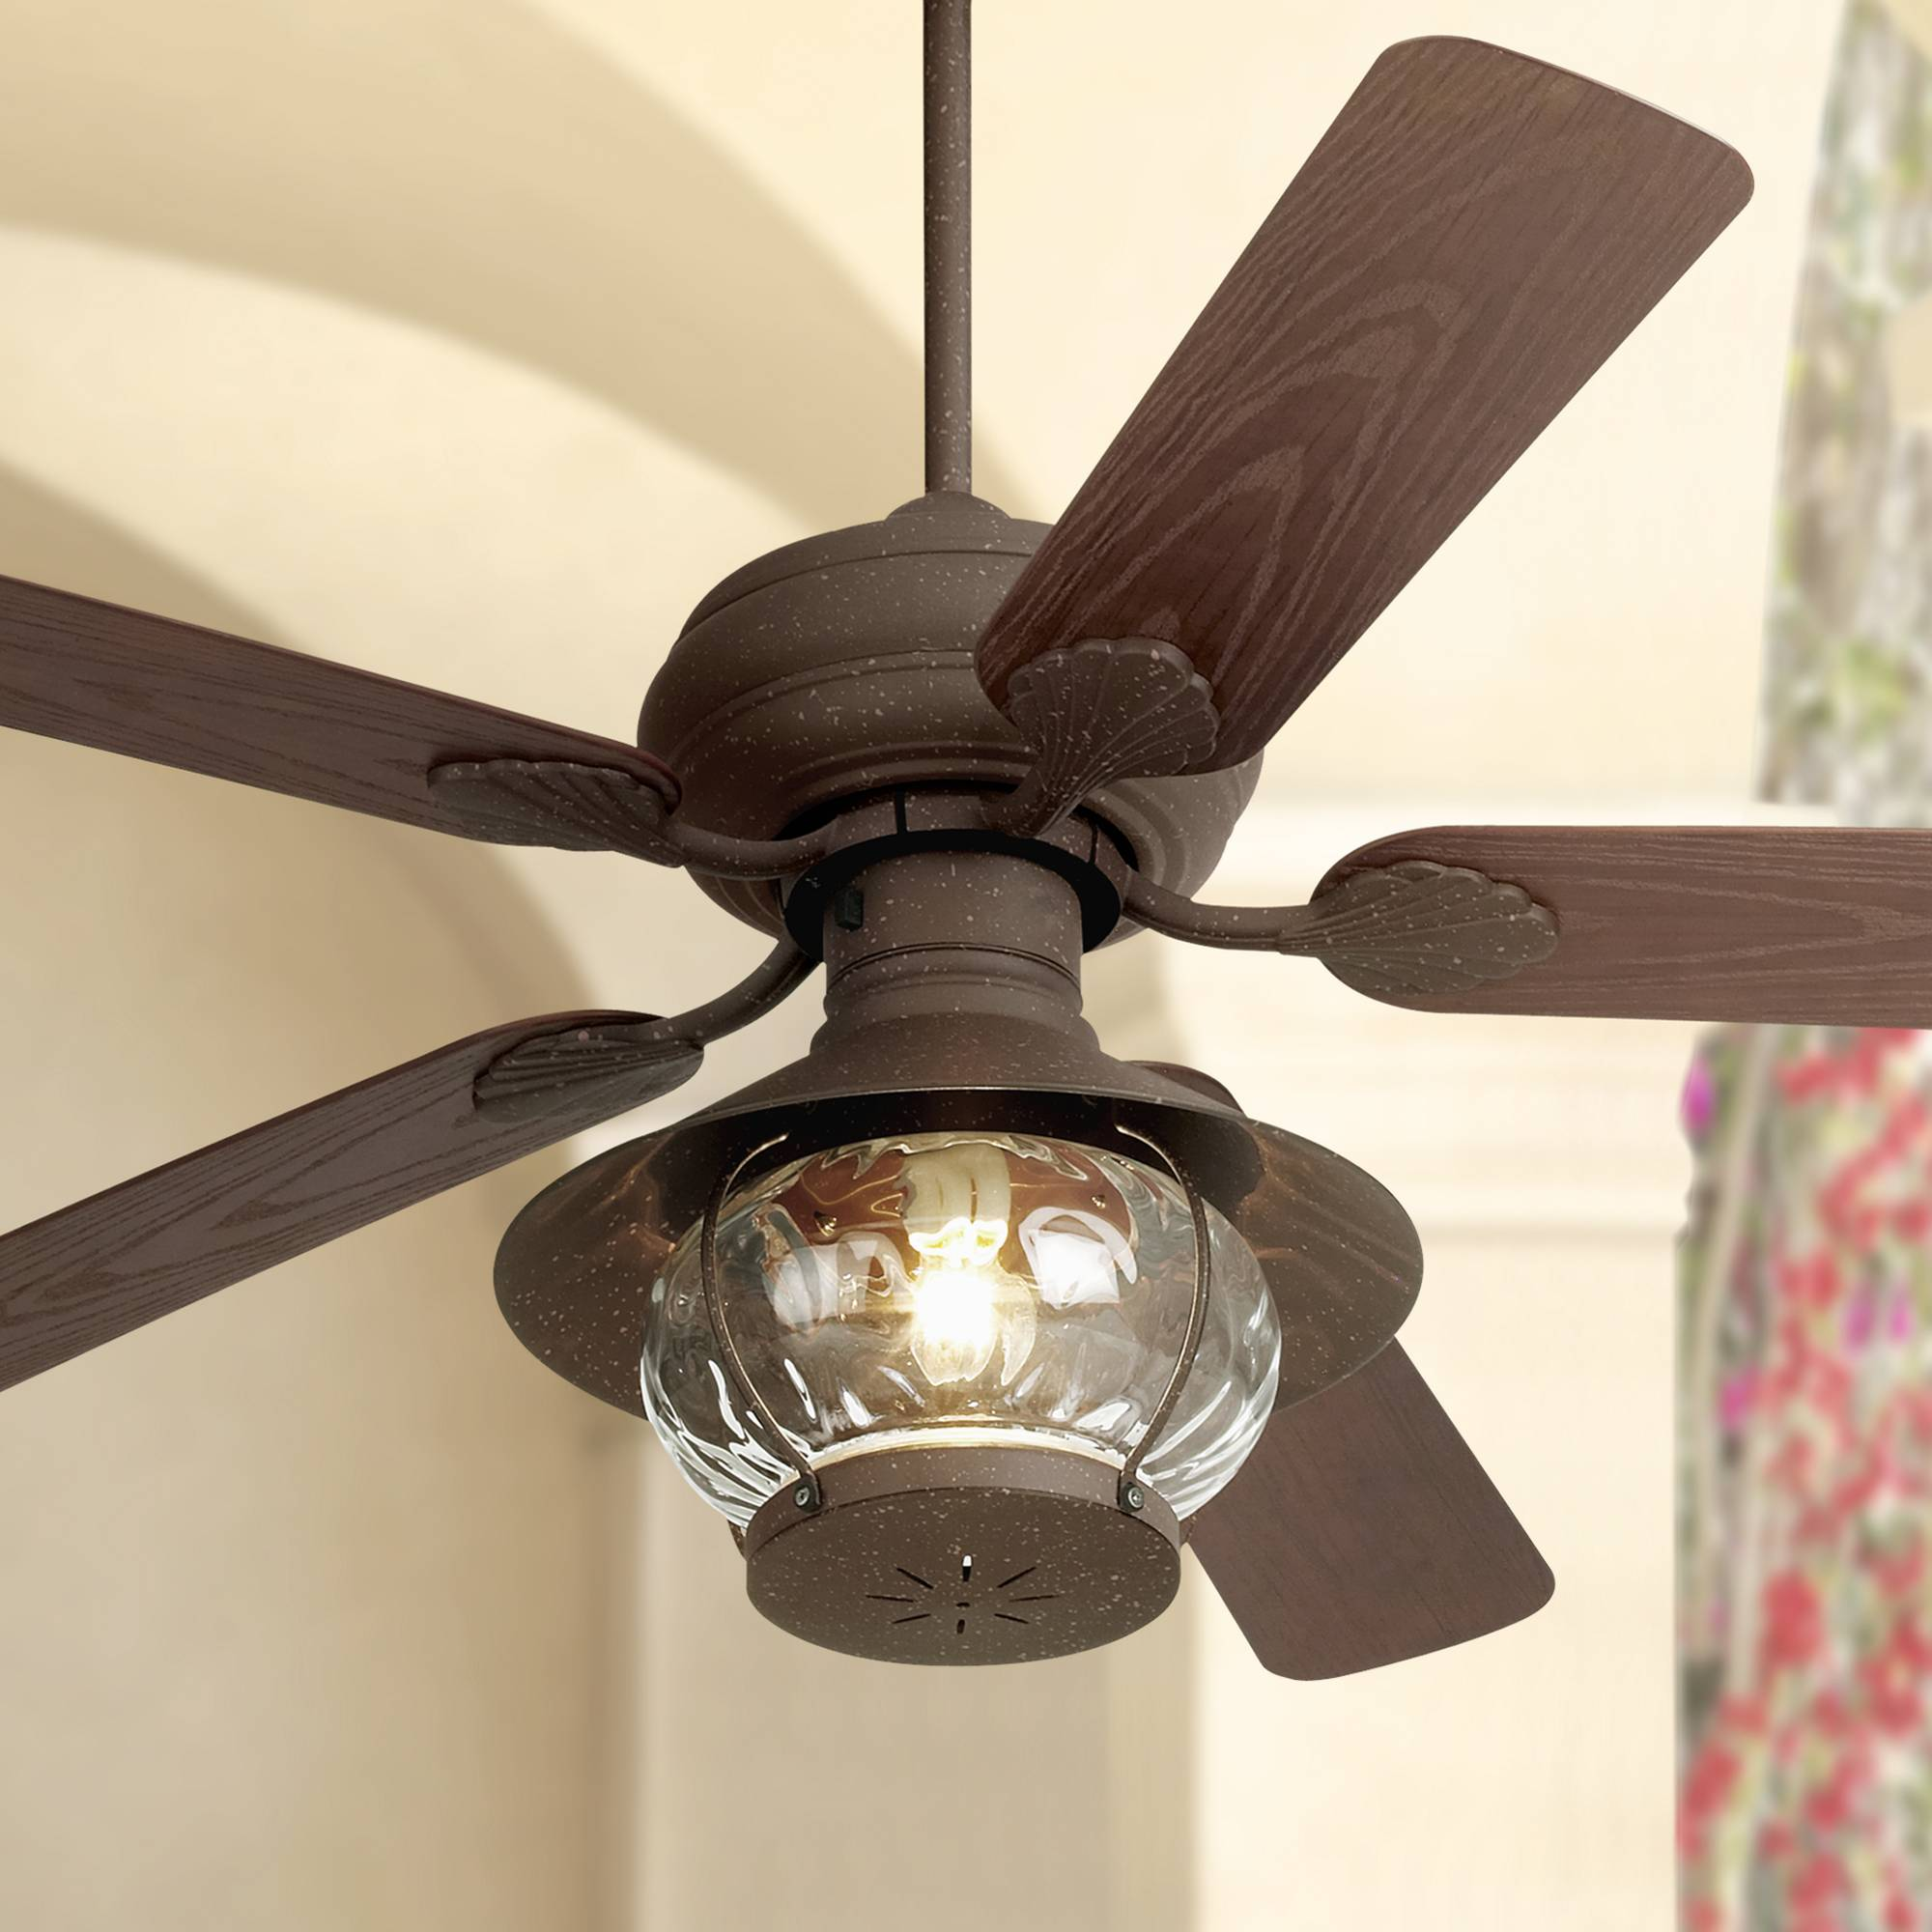 Ceiling Fans Furniture Decor Responsive Image